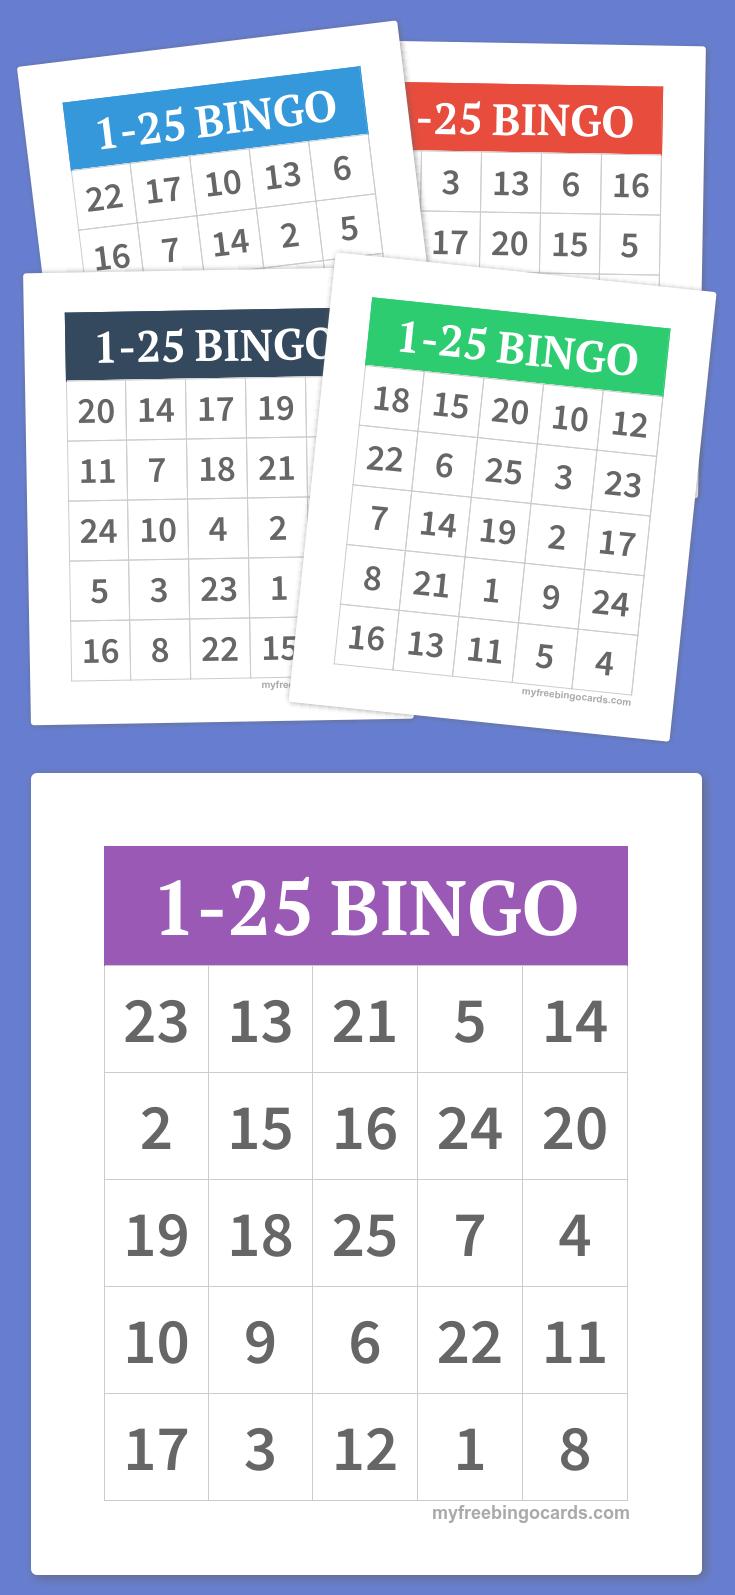 1-25 Bingo | Diy | Alphabet Bingo, Bingo Cards, Bingo - Free Printable Bingo Cards With Numbers